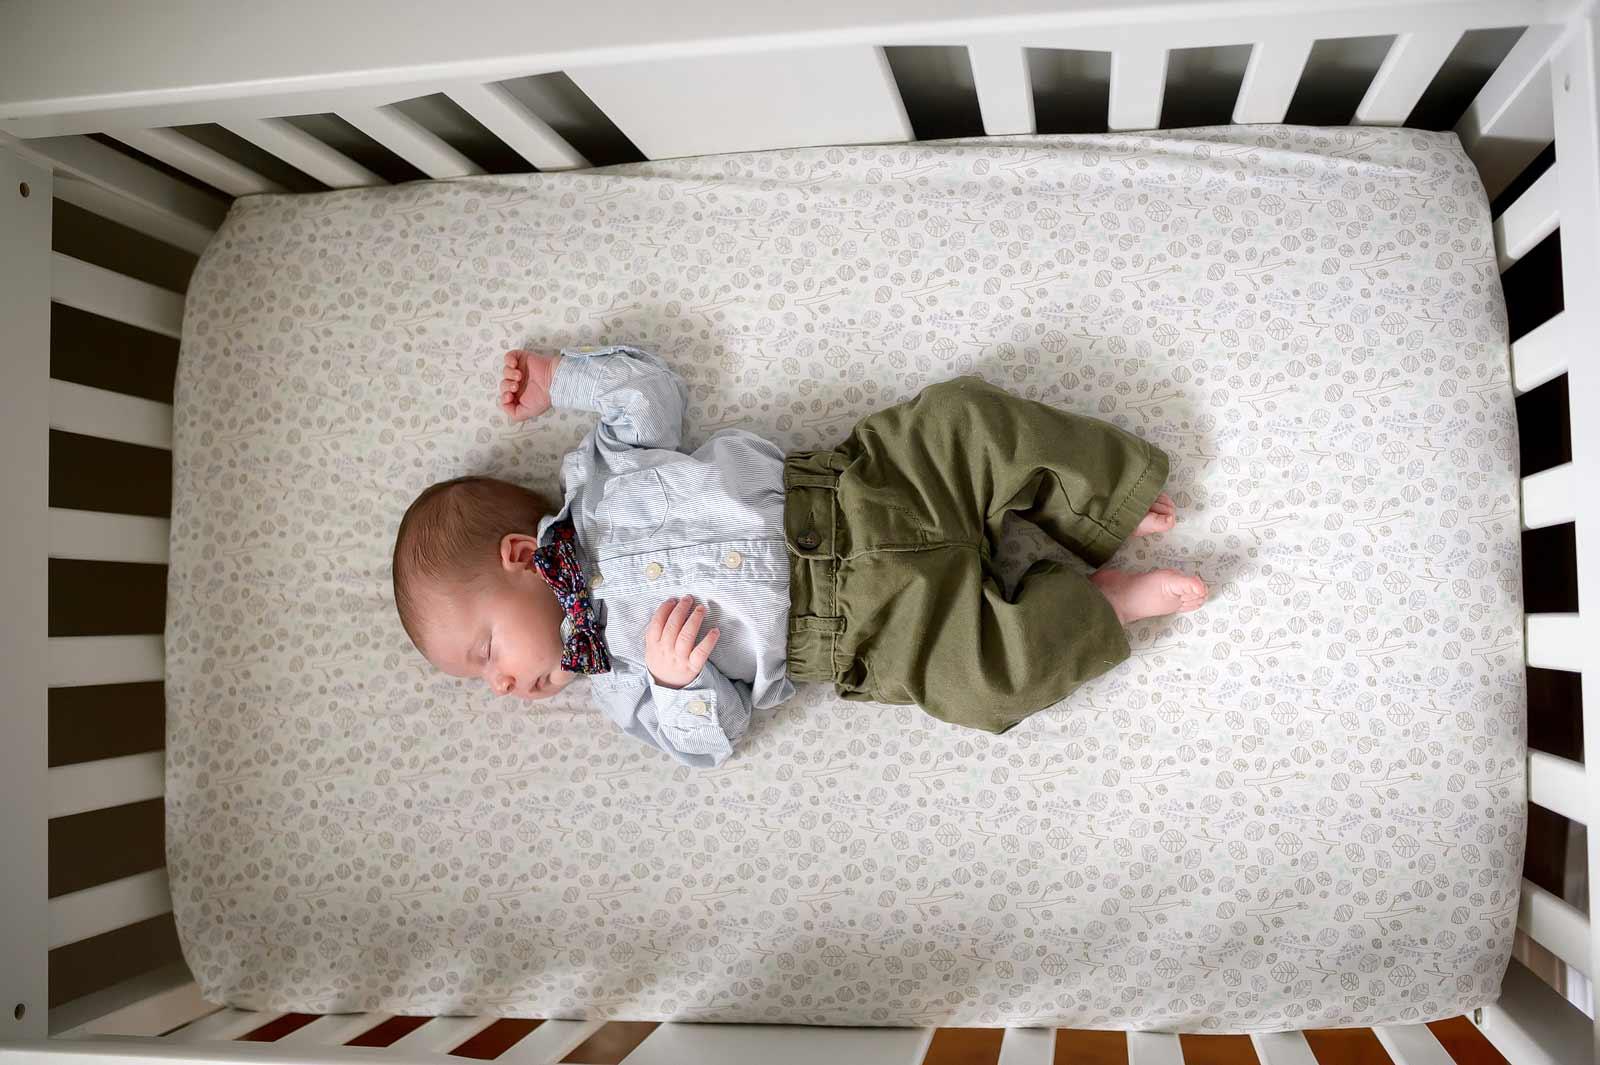 gianrico-newborn-sneakpeek-07